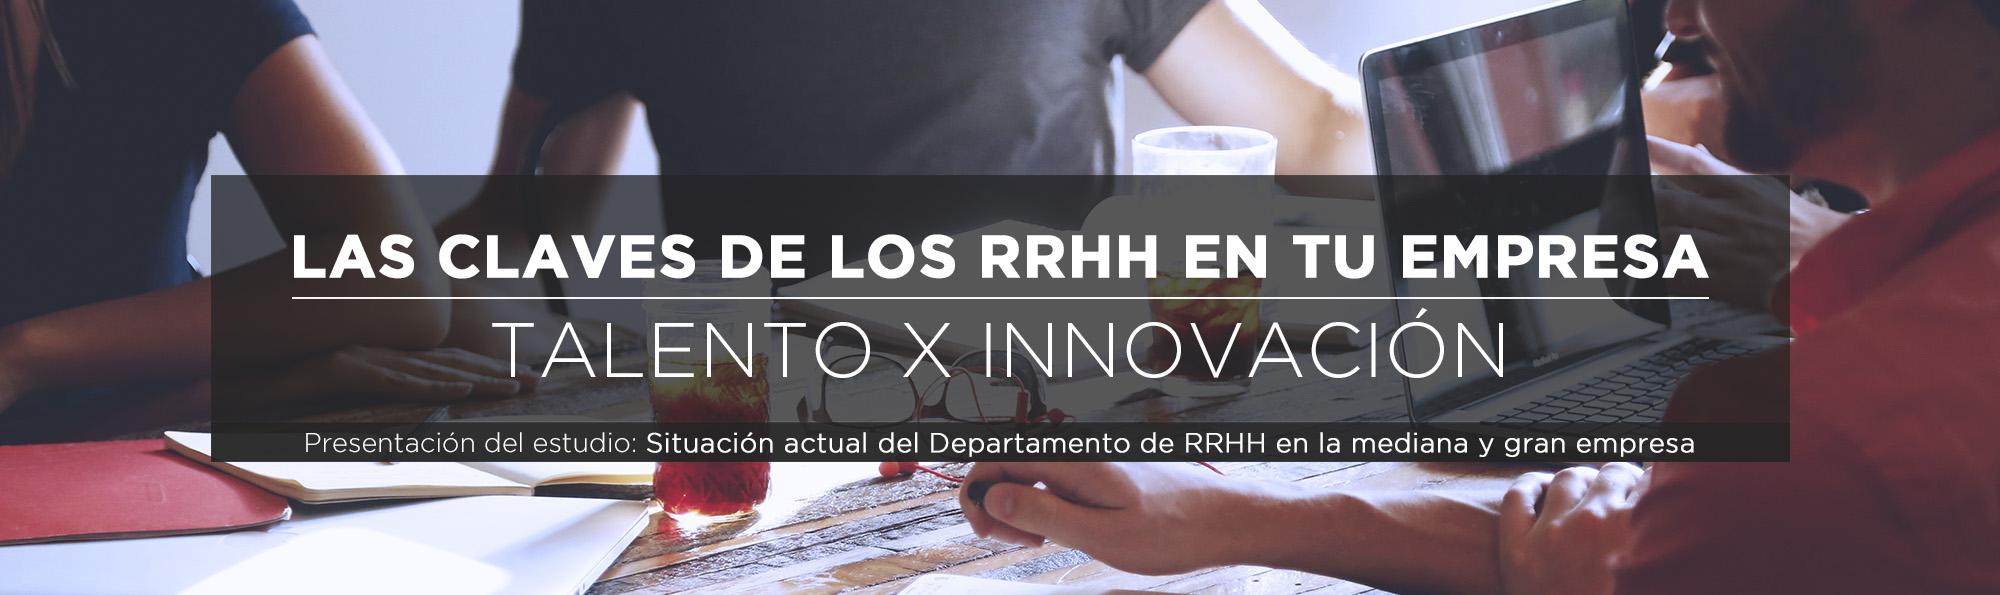 Claves para innovar en RRHH